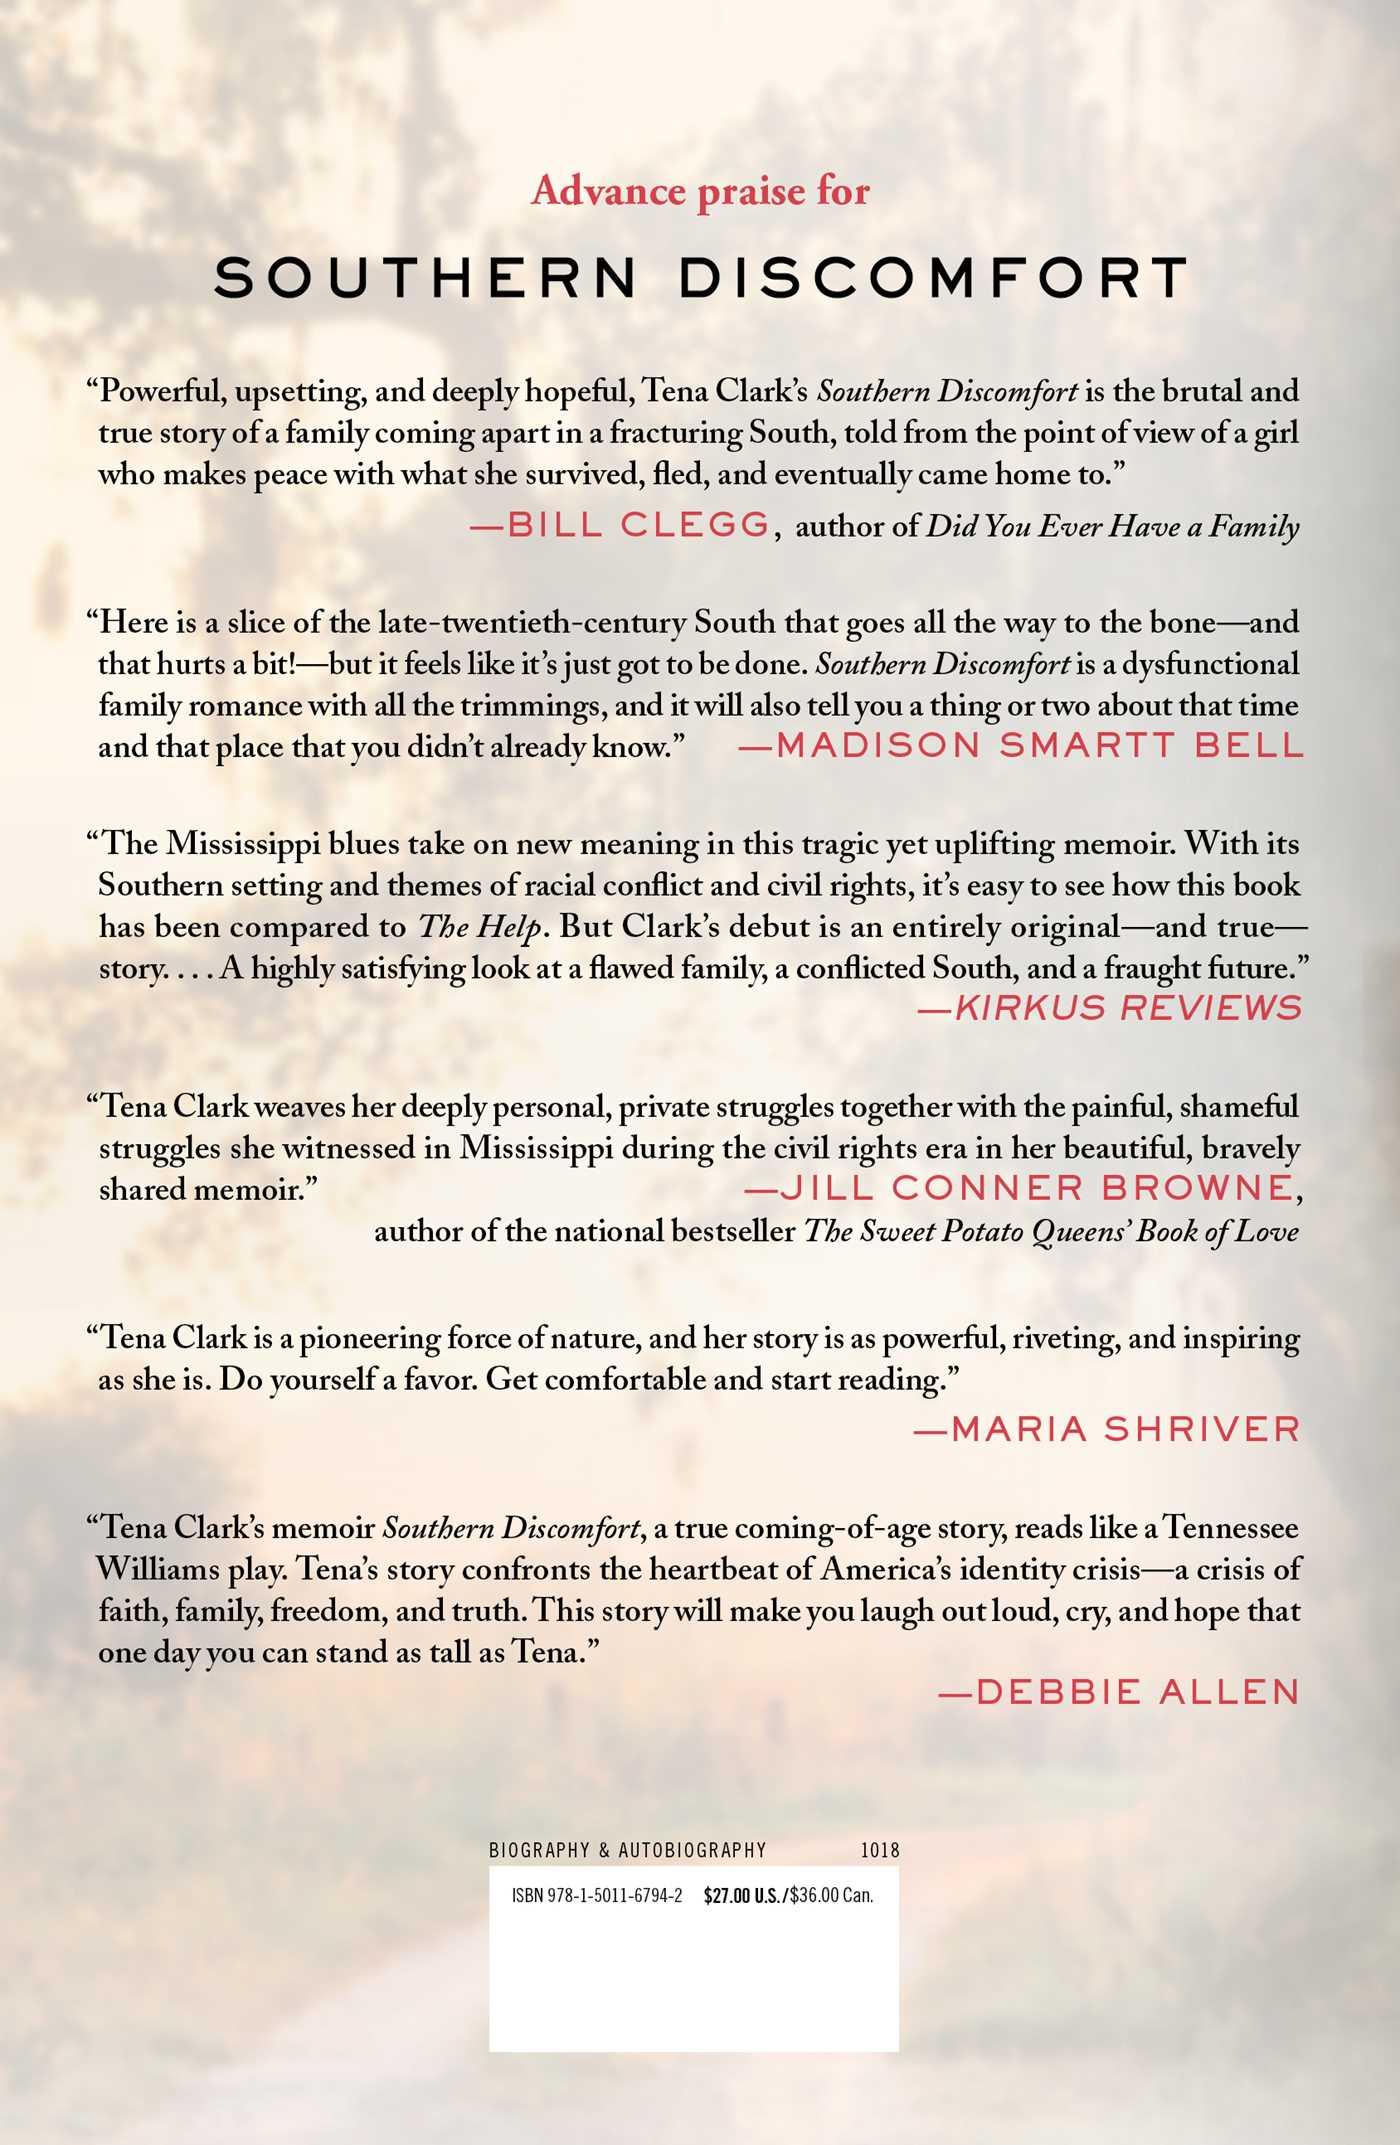 Southern discomfort book by tena clark official publisher page southern discomfort 9781501167942 hr southern discomfort 9781501167942 hr back solutioingenieria Choice Image